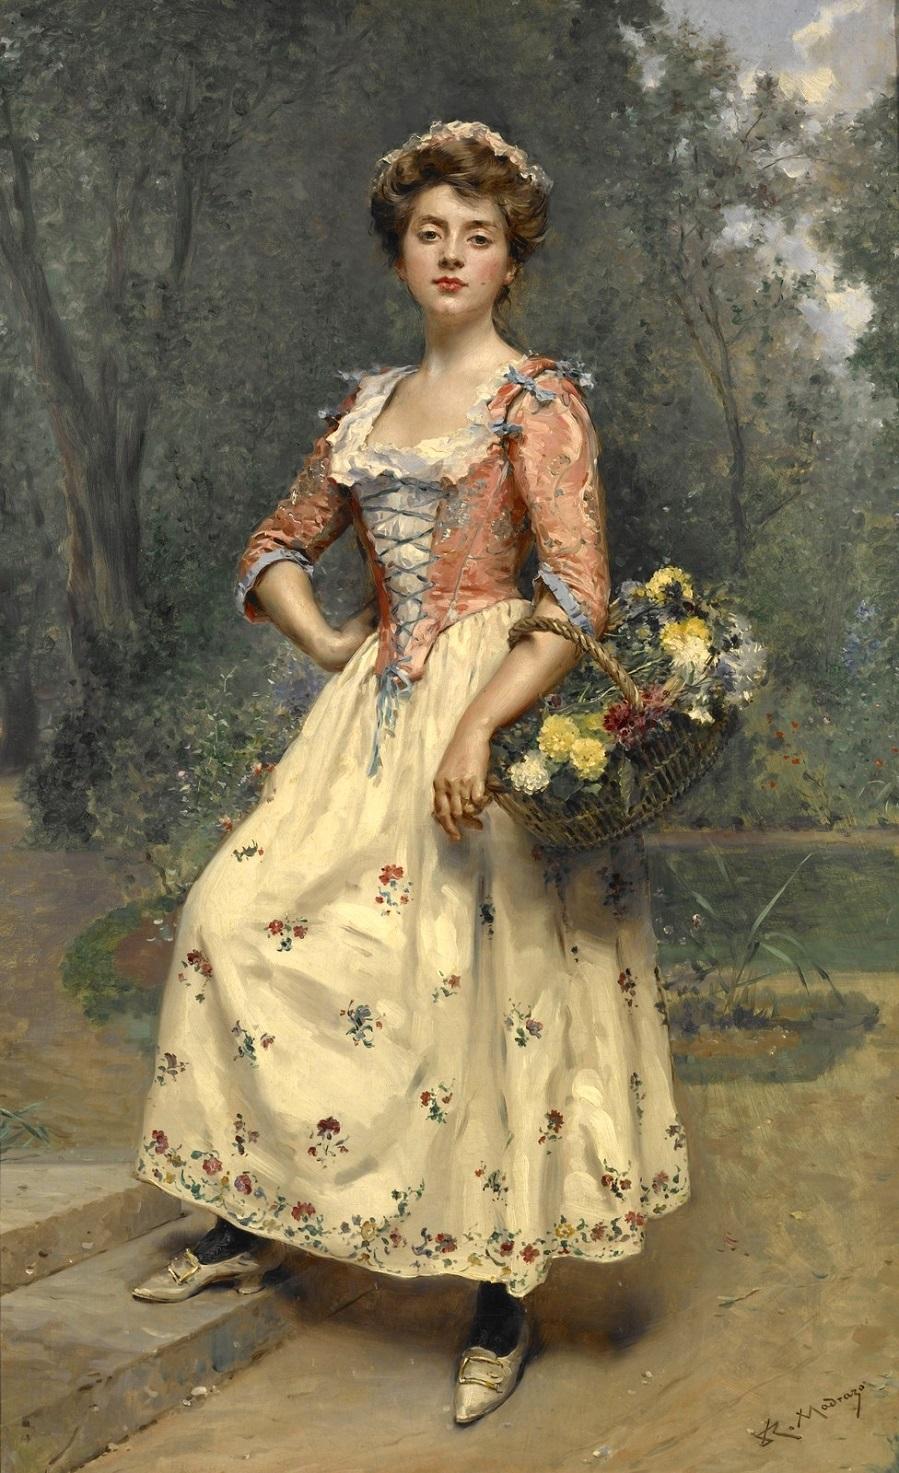 Весенняя красавица (Spring beauty)_97 х 58.2_х.,м._Индианополис, Музей искусства.jpg